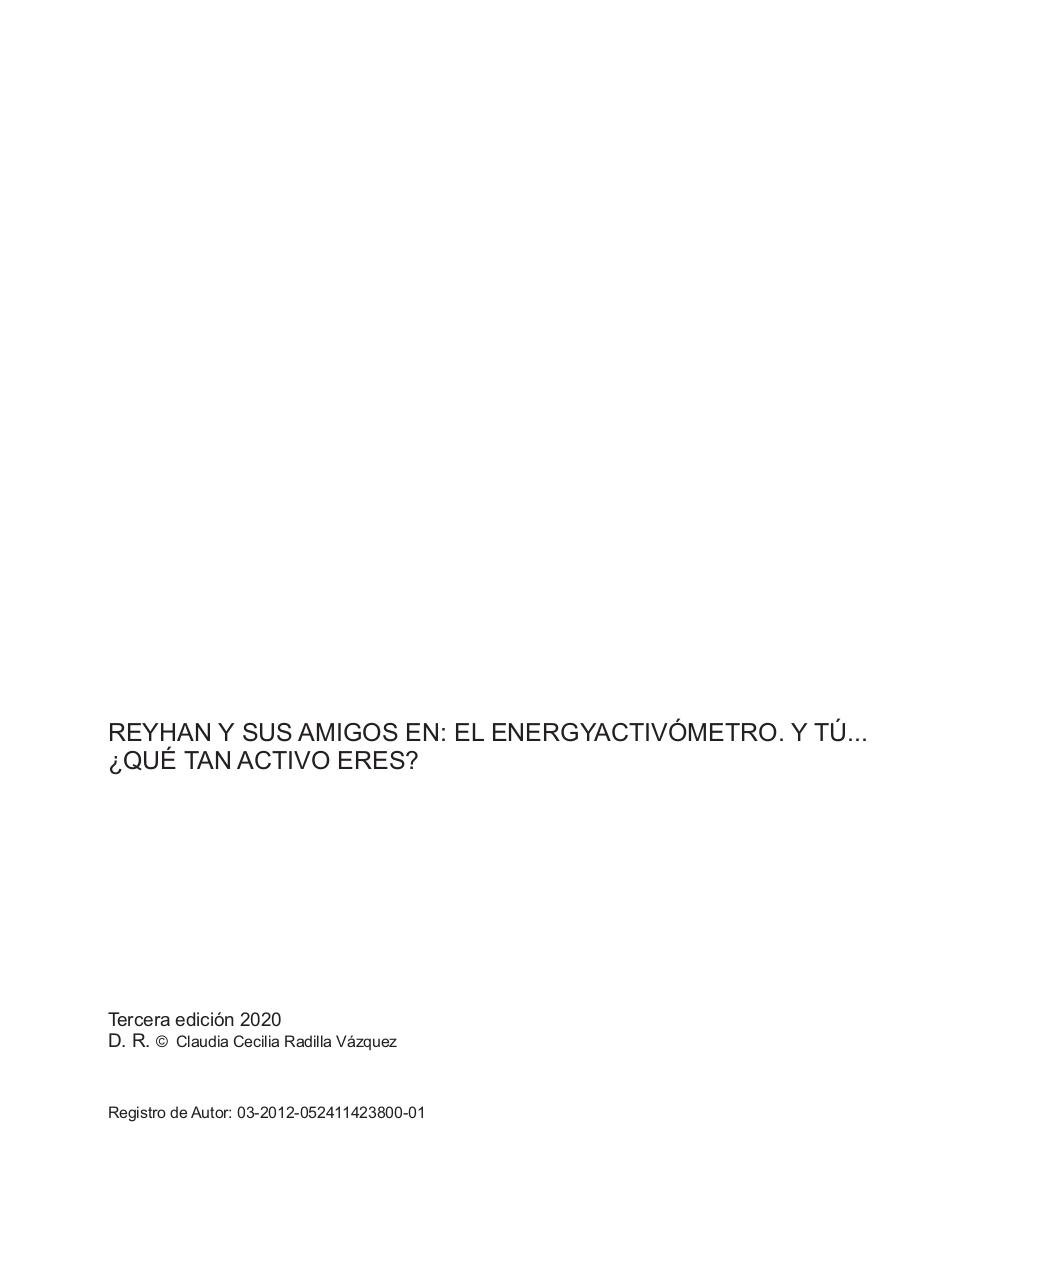 Energyactivometro digital_page-0003